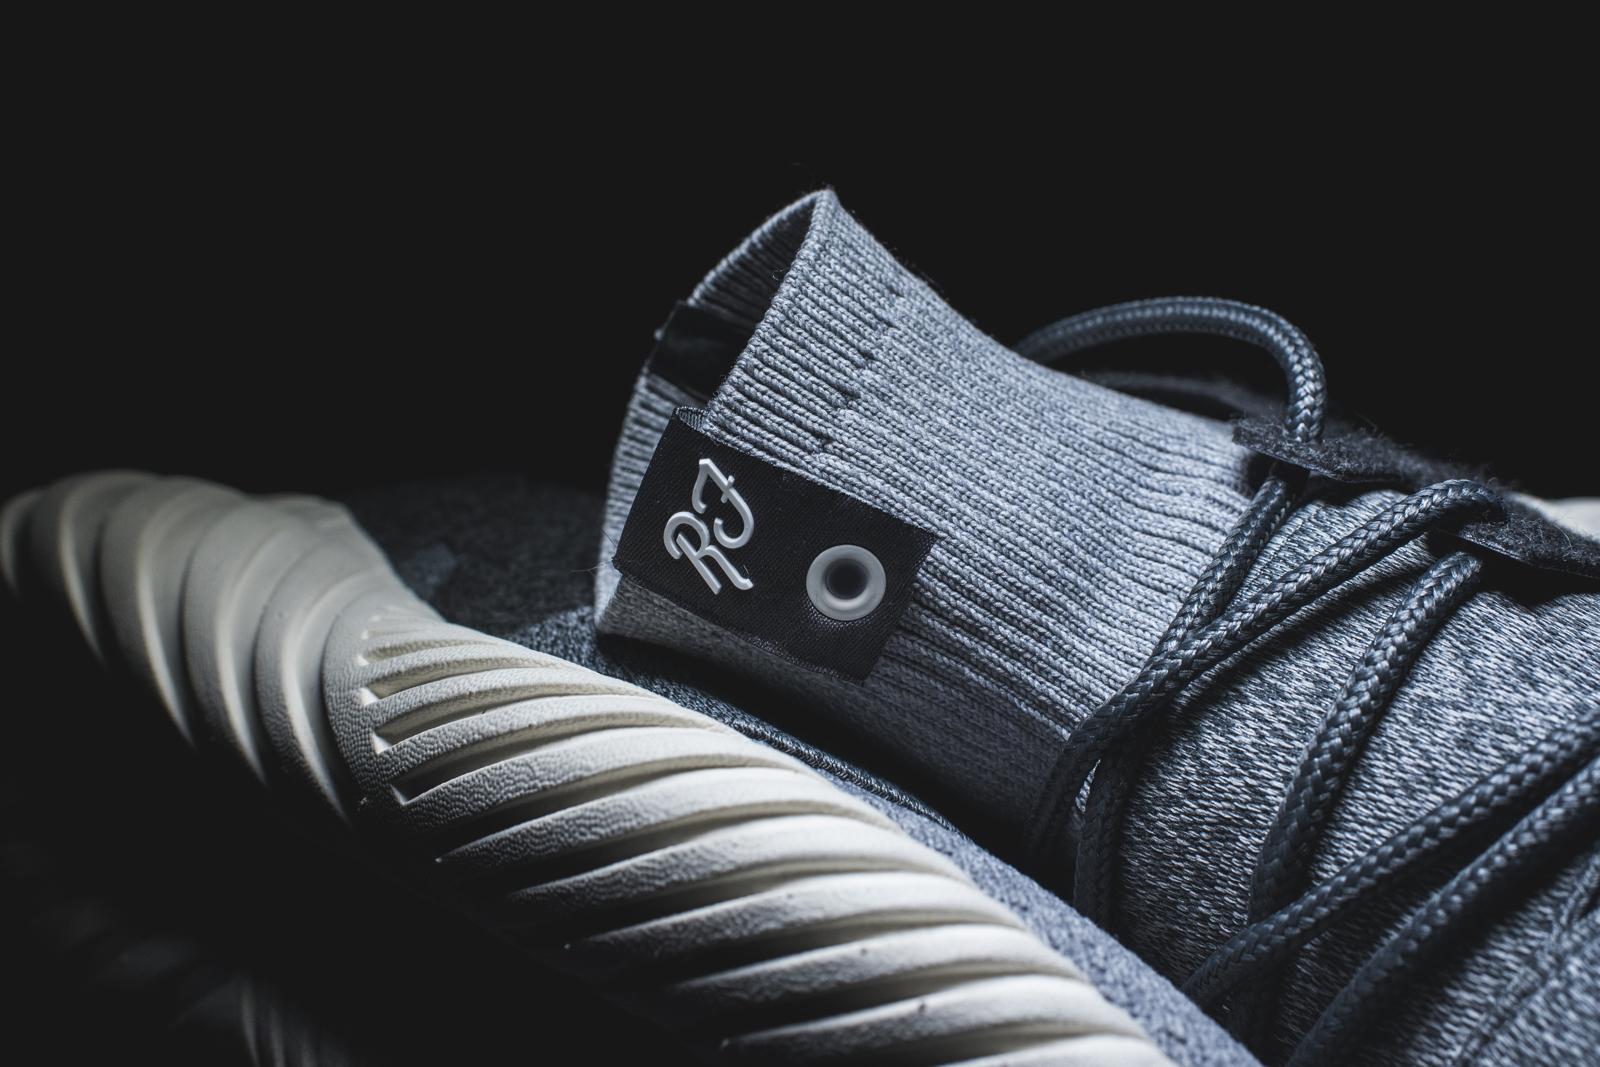 Adidas Originals Tubular Doom PK Black Sneakers S 80508